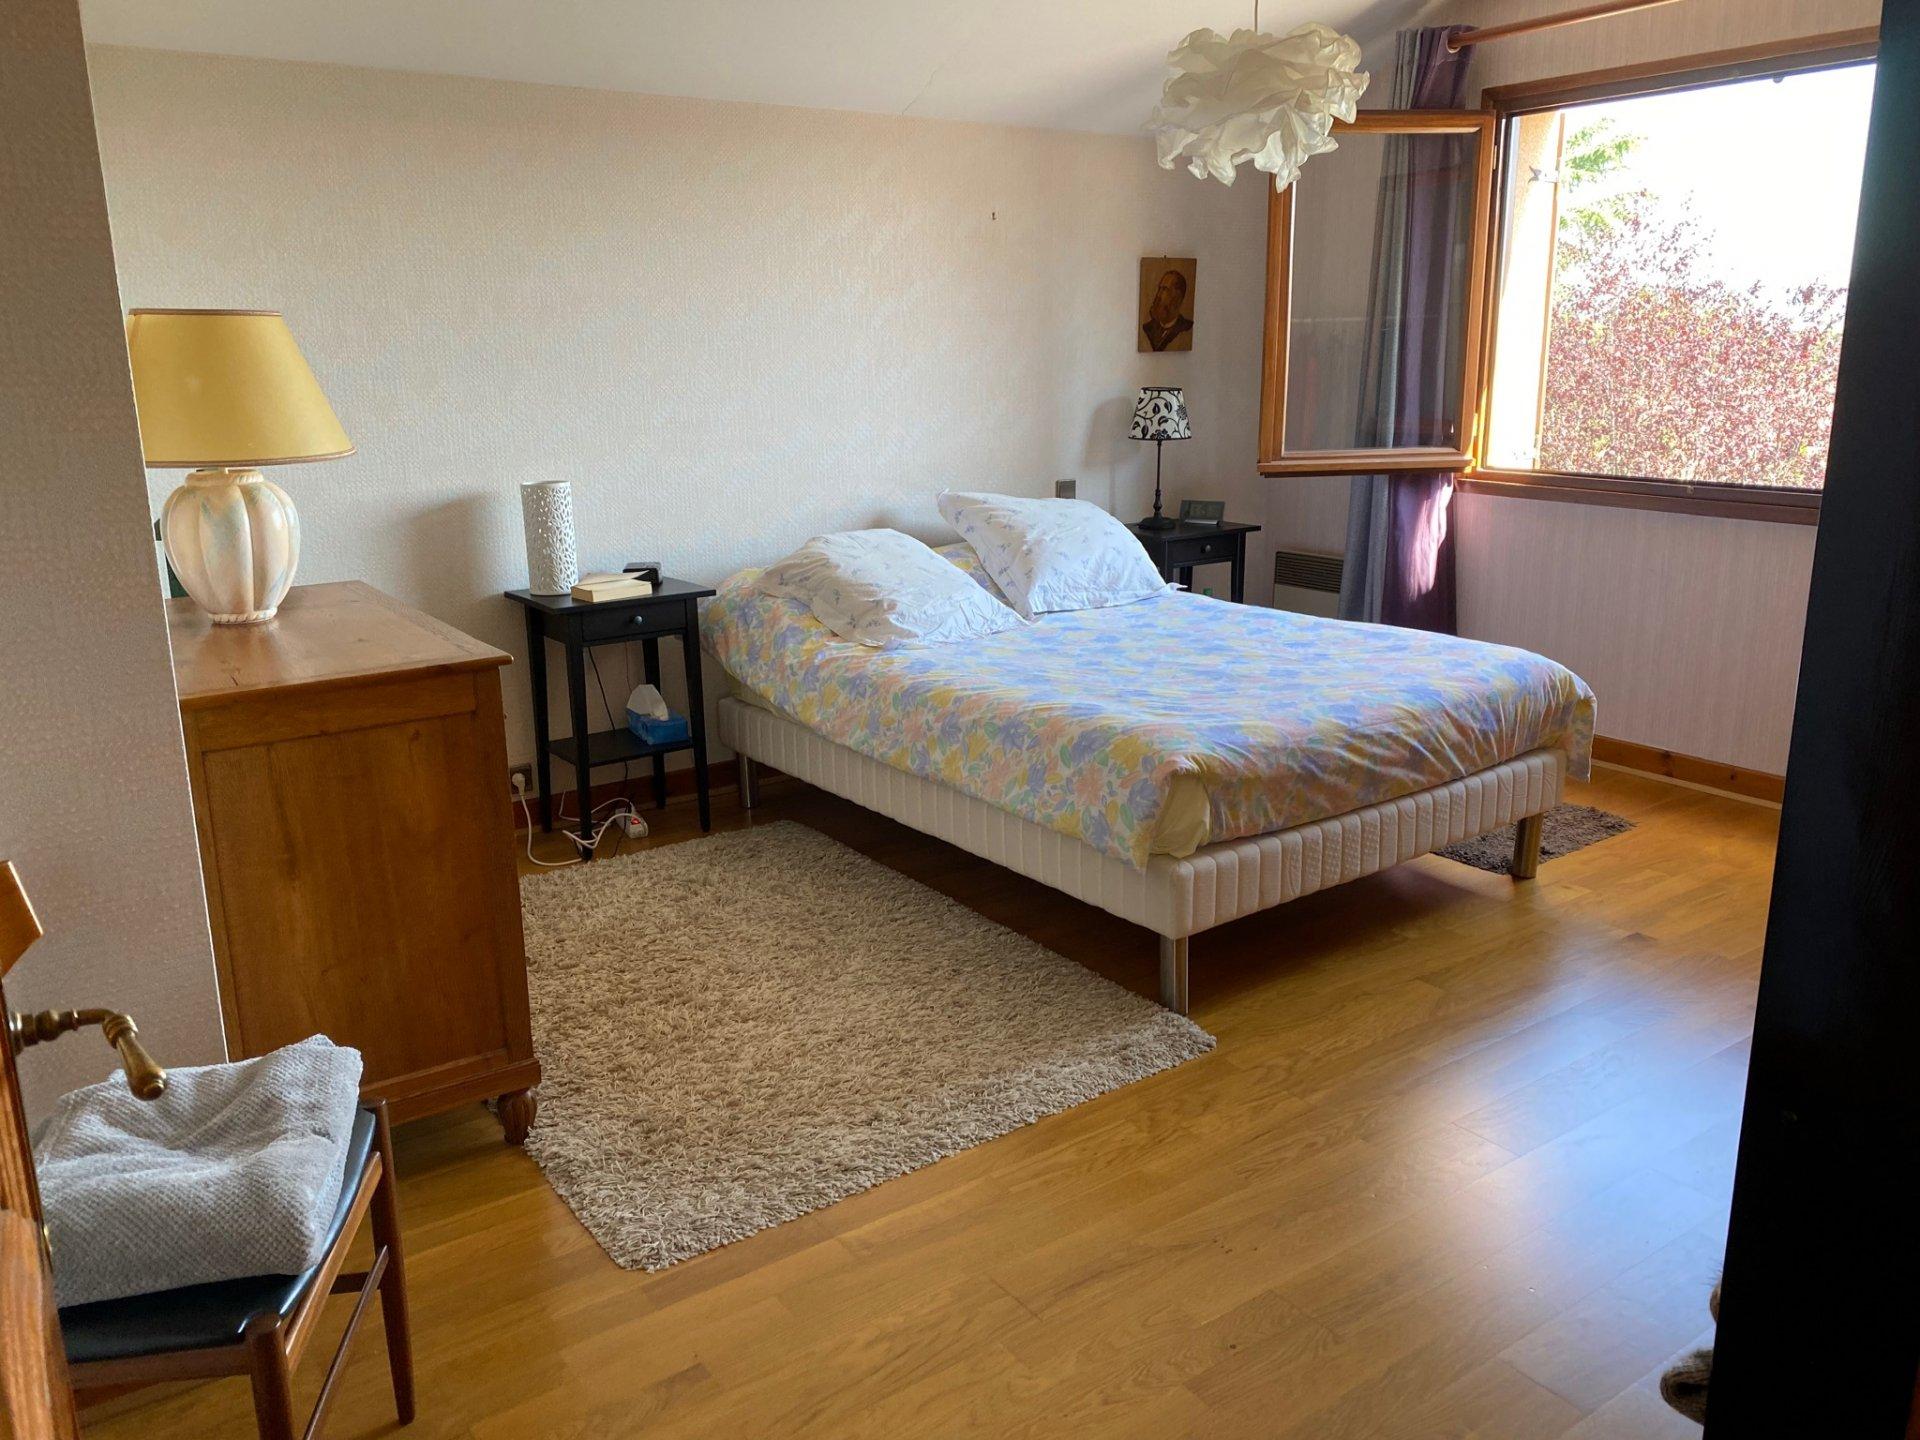 6194lkm - Maison Familiale - BELLERIVE/A